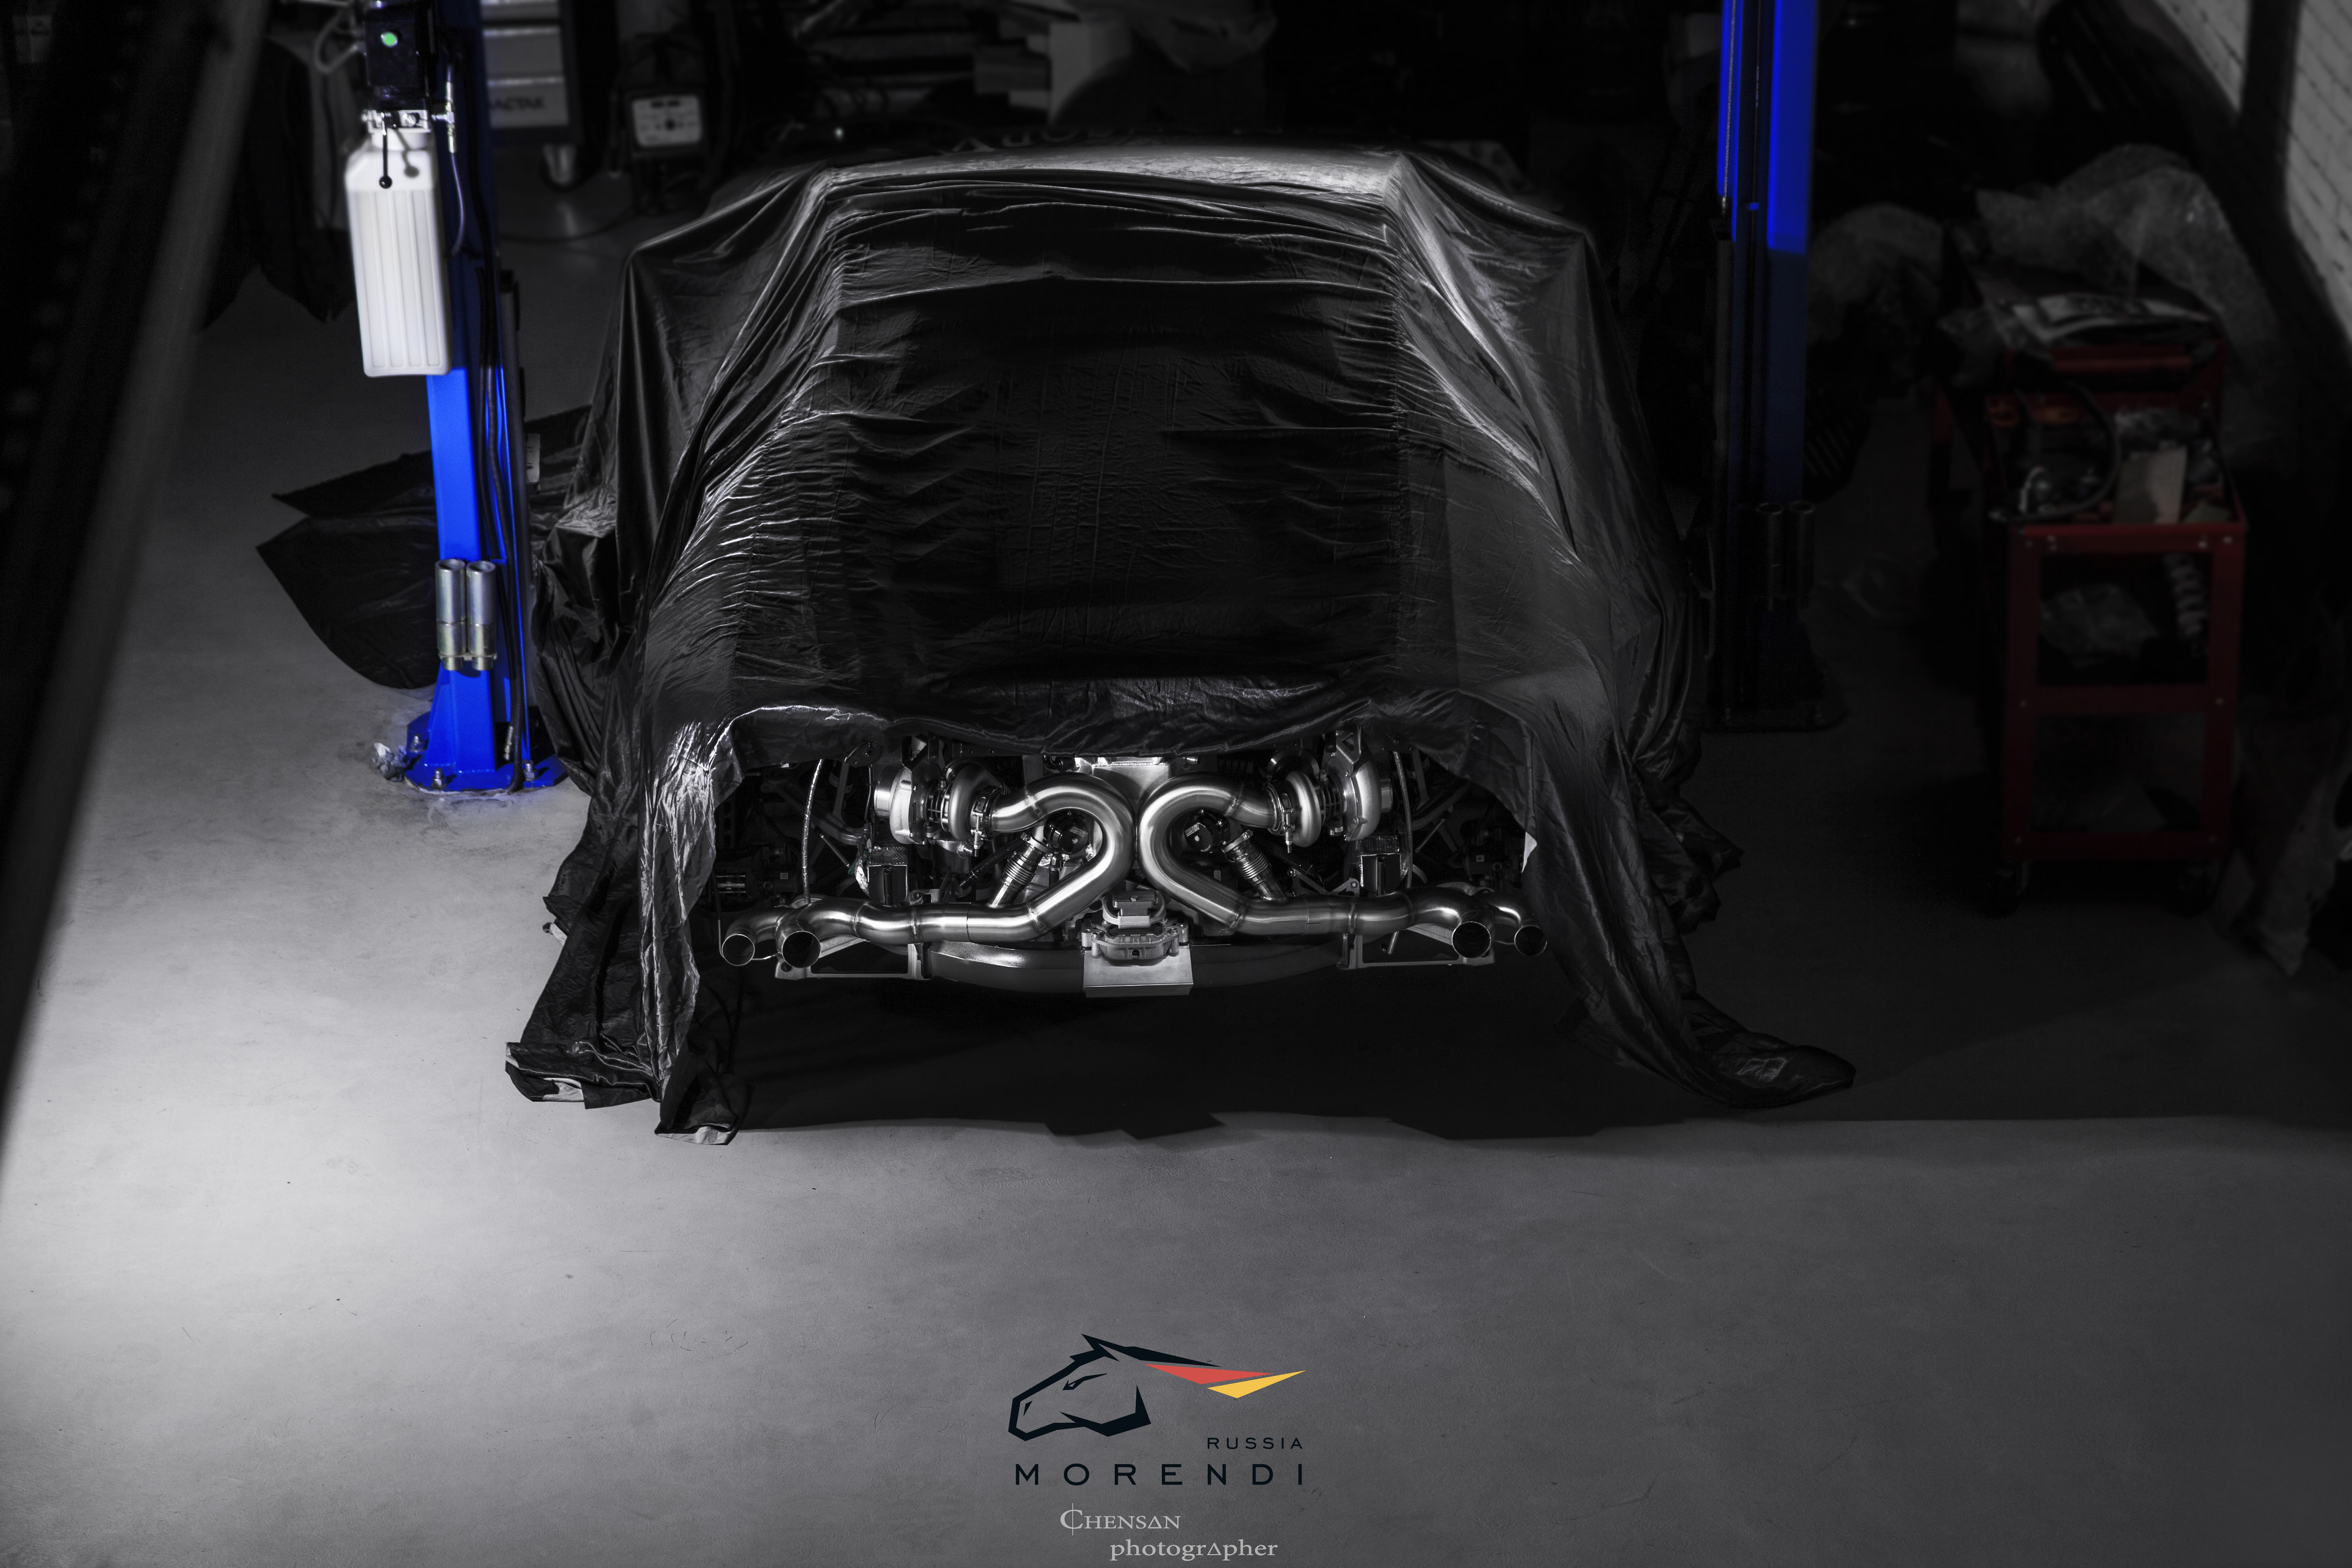 DSC OFF: Заезд Lamborghini Huracan TwinTurbo построенной в Morendi против Nissan GTR 950 лс